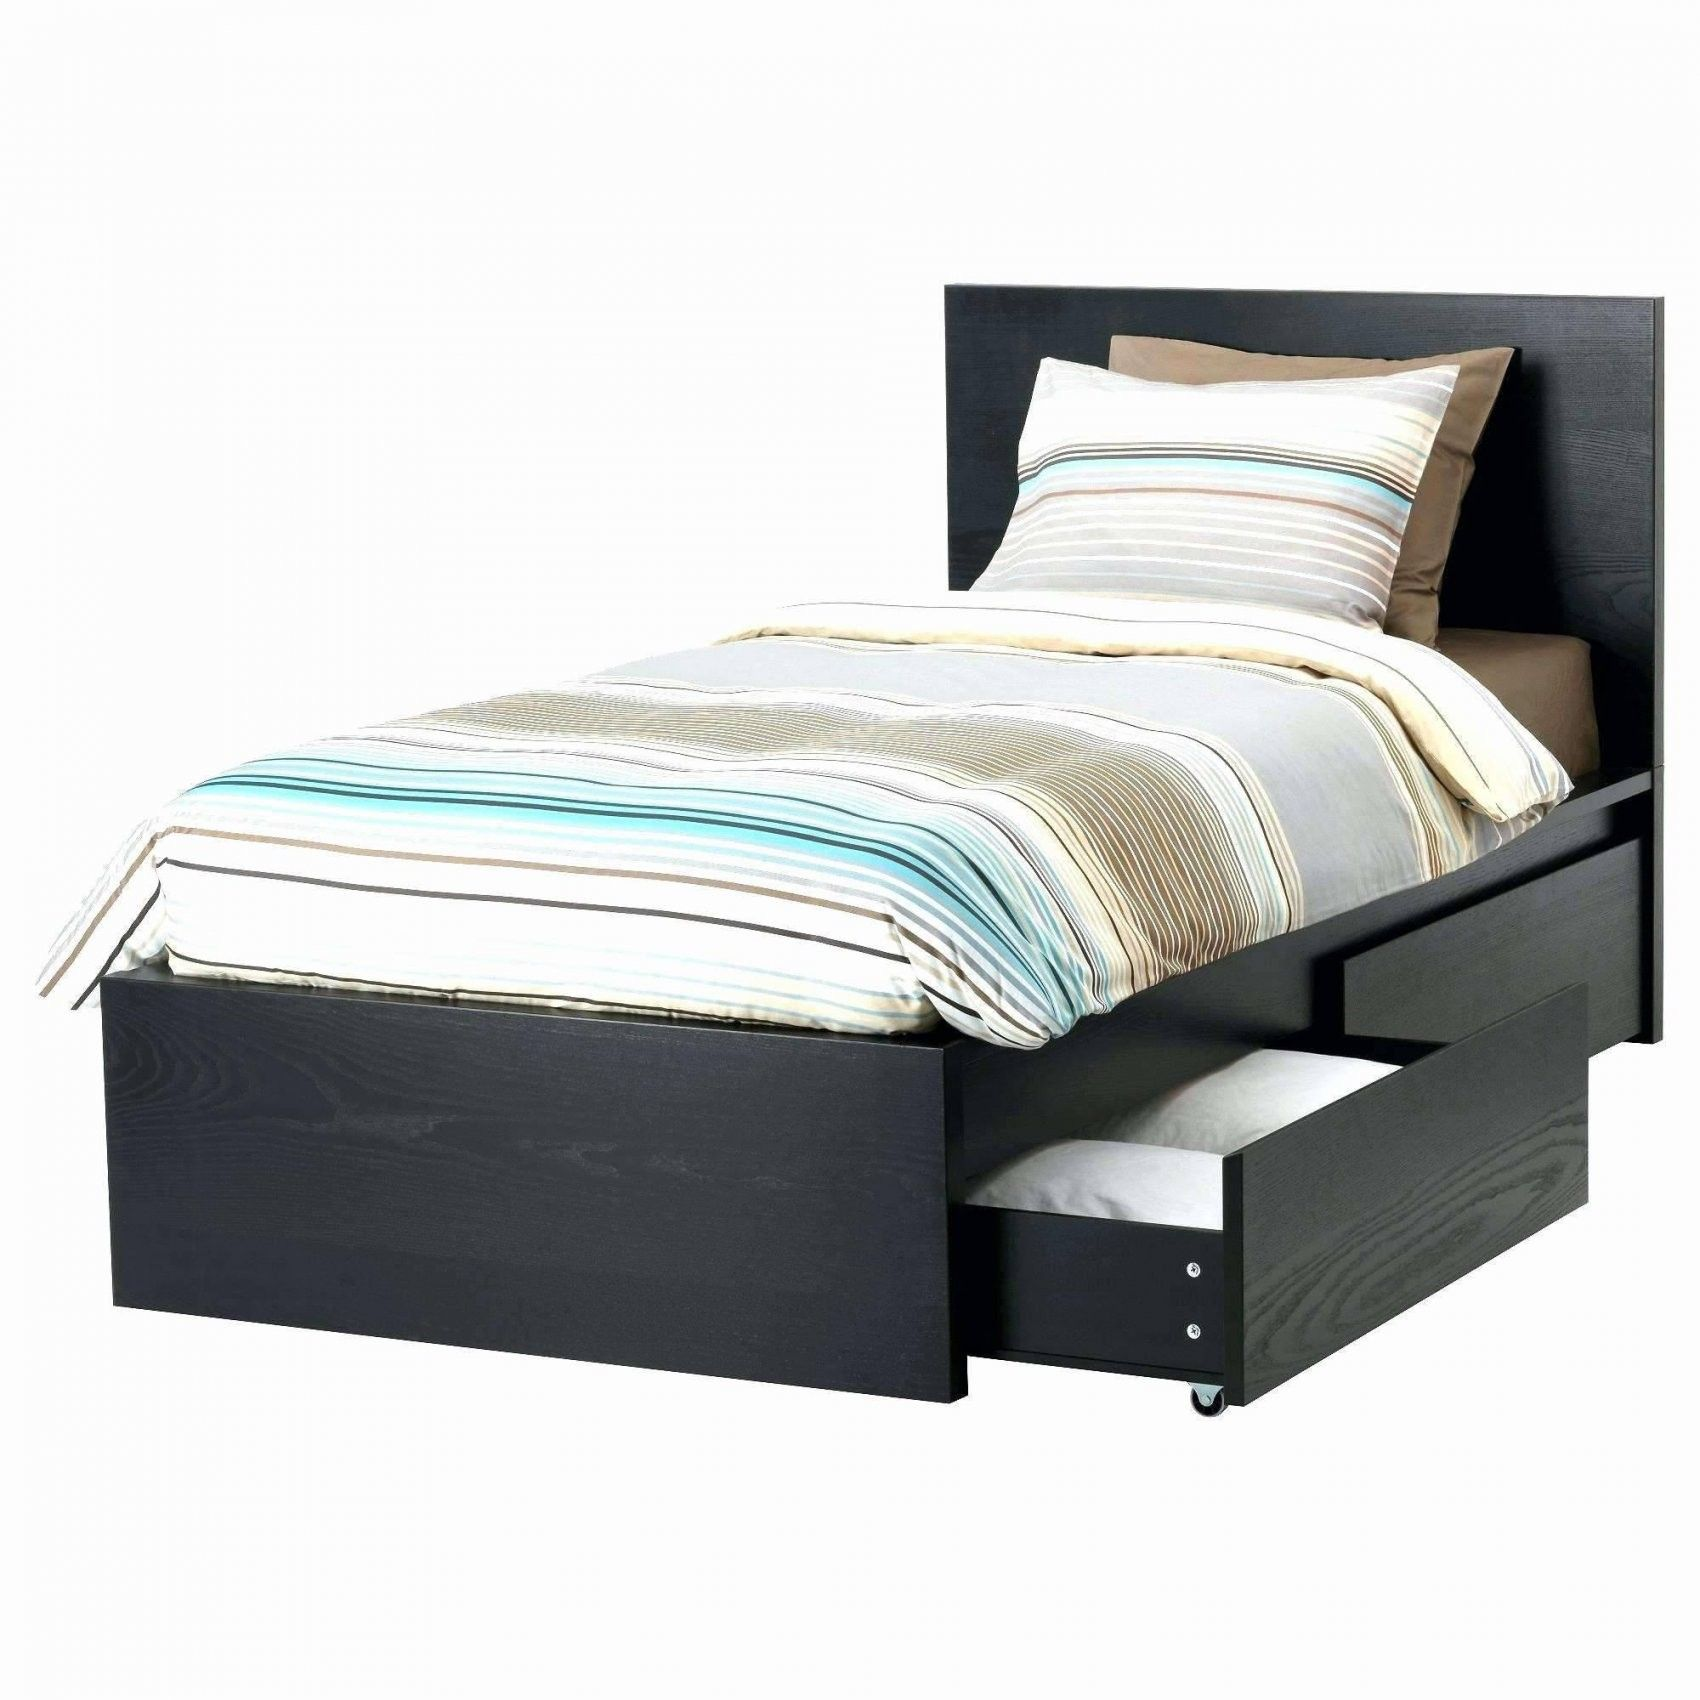 Pin On Bett